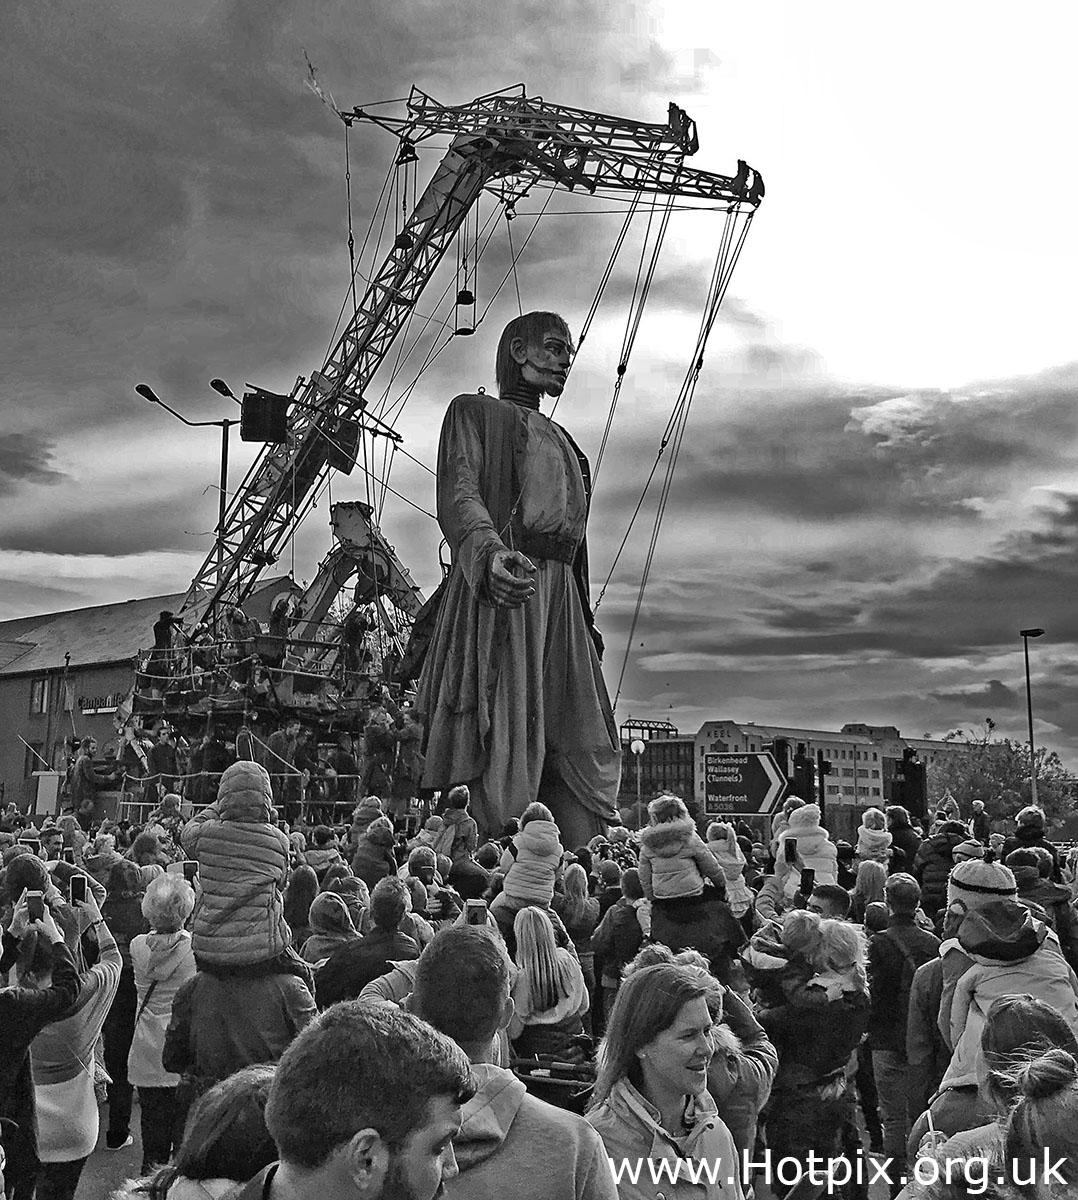 GoTonySmith,HotpixUK,Hotpix,Tony Smith,HousingITguy,365,Project365,2nd 365,HotpixUK365,Tone Smith,Liverpool,Dream,Liverpool Dream,giant,people,statues,machines